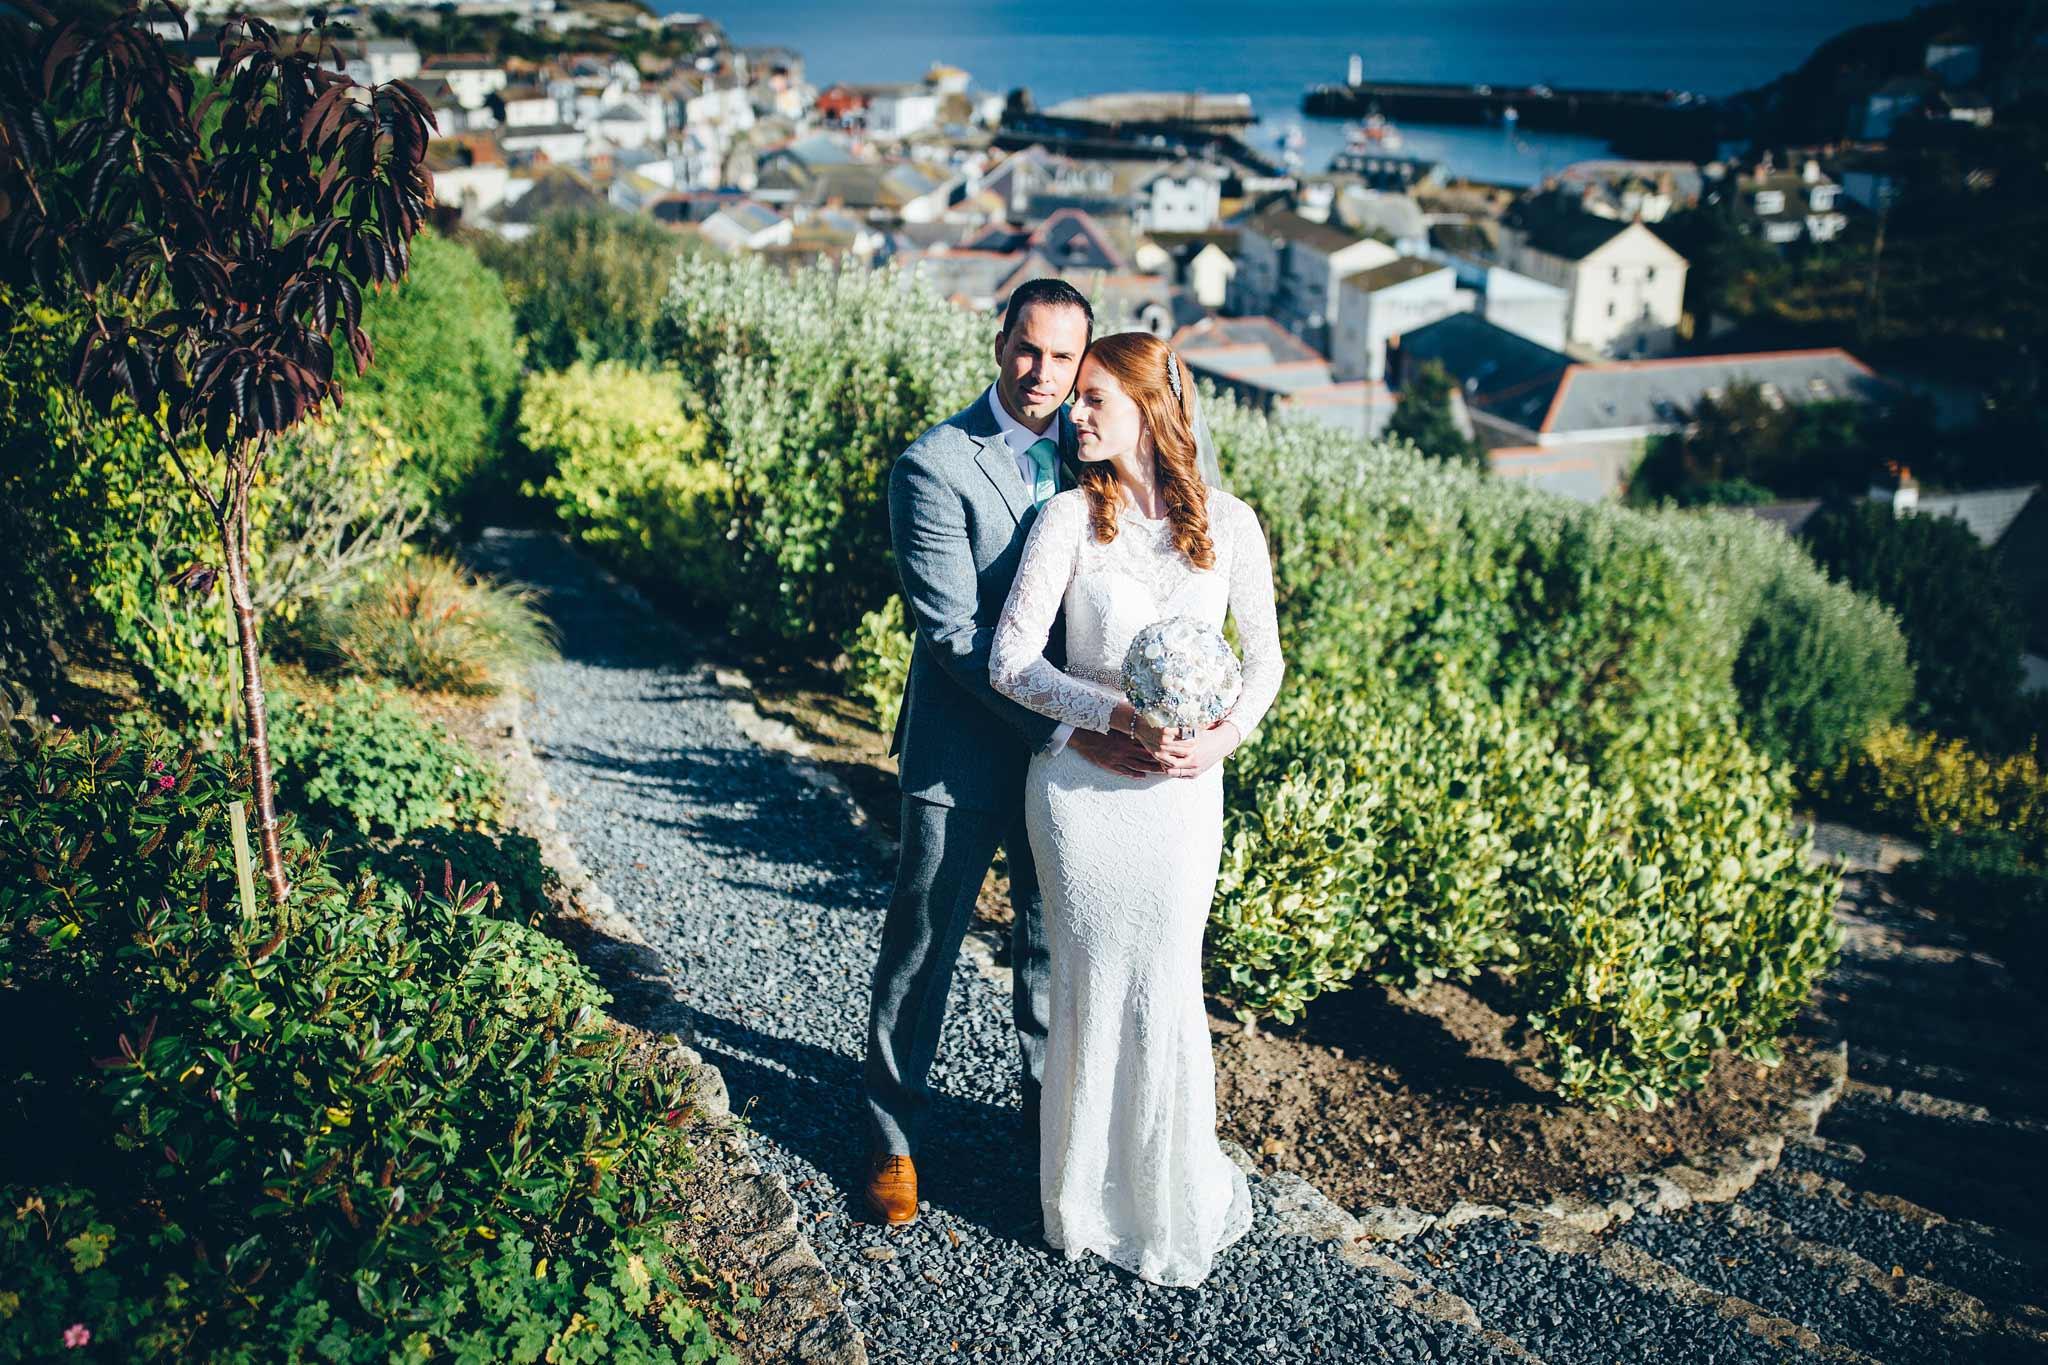 Wedding Photographer Polpier and Penpol 10